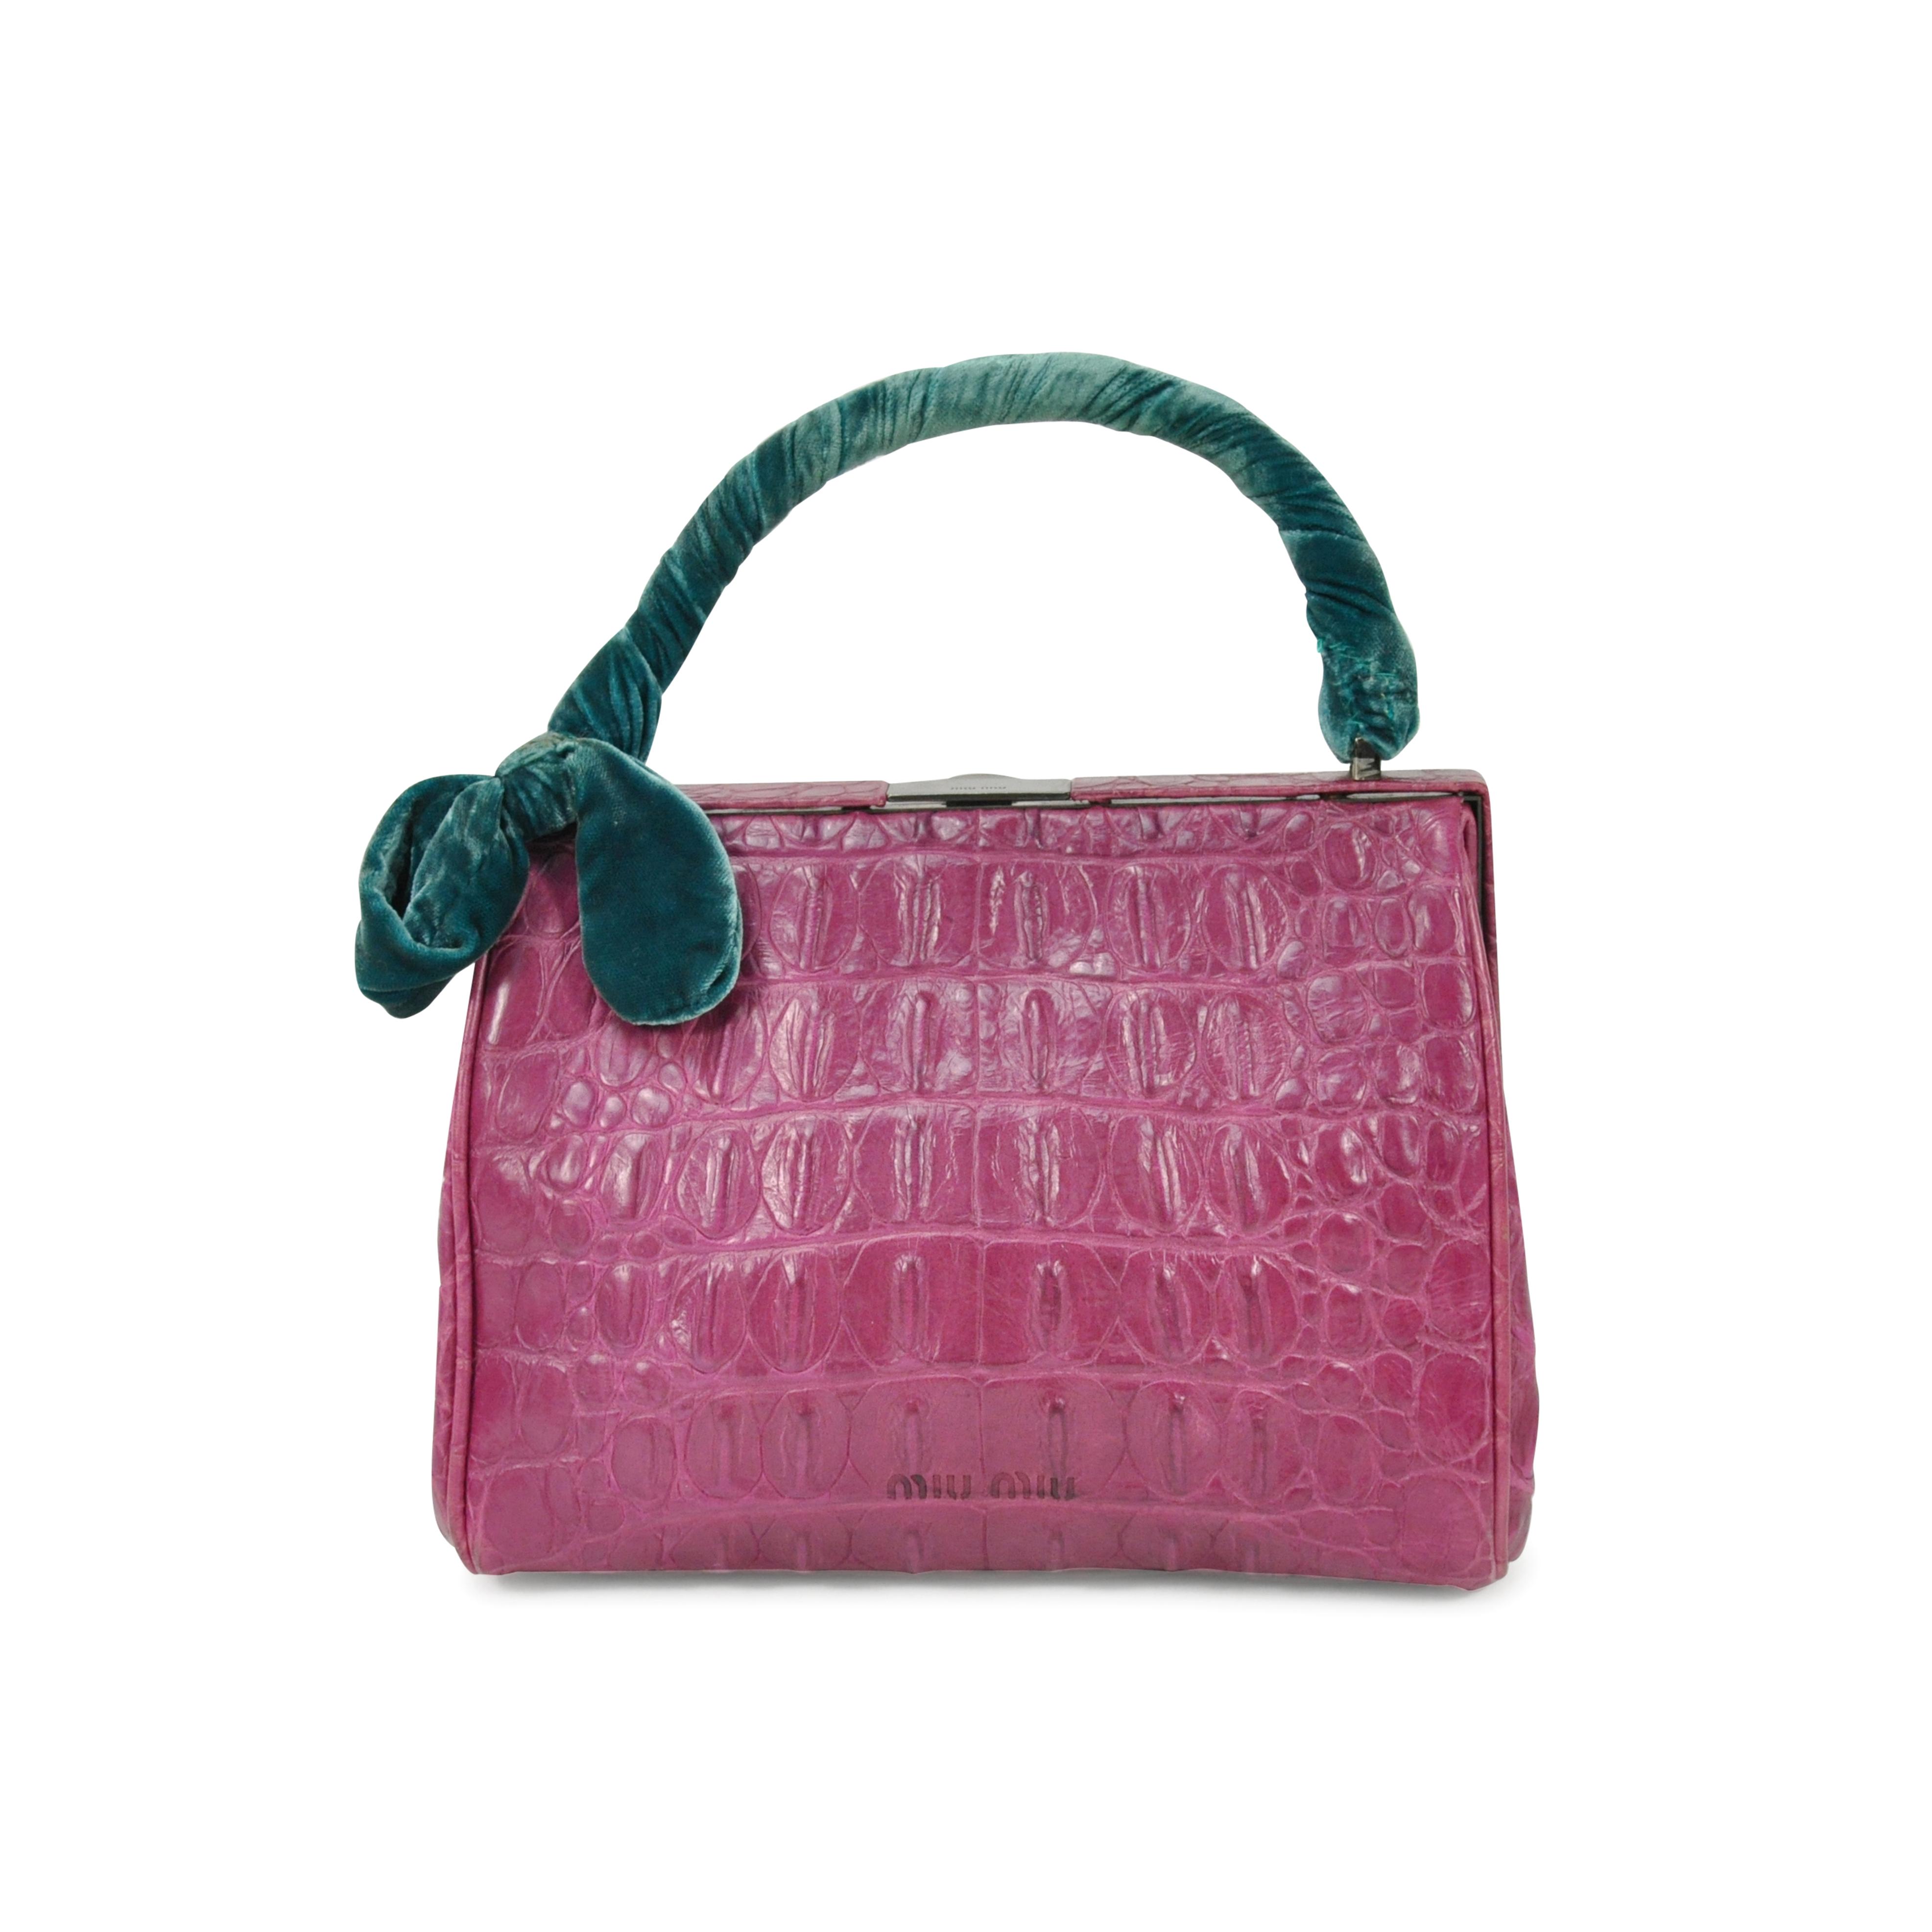 55b59b1b63f5 Authentic Second Hand Miu Miu Velvet Handle Crocodile Handbag  (PSS-304-00021)